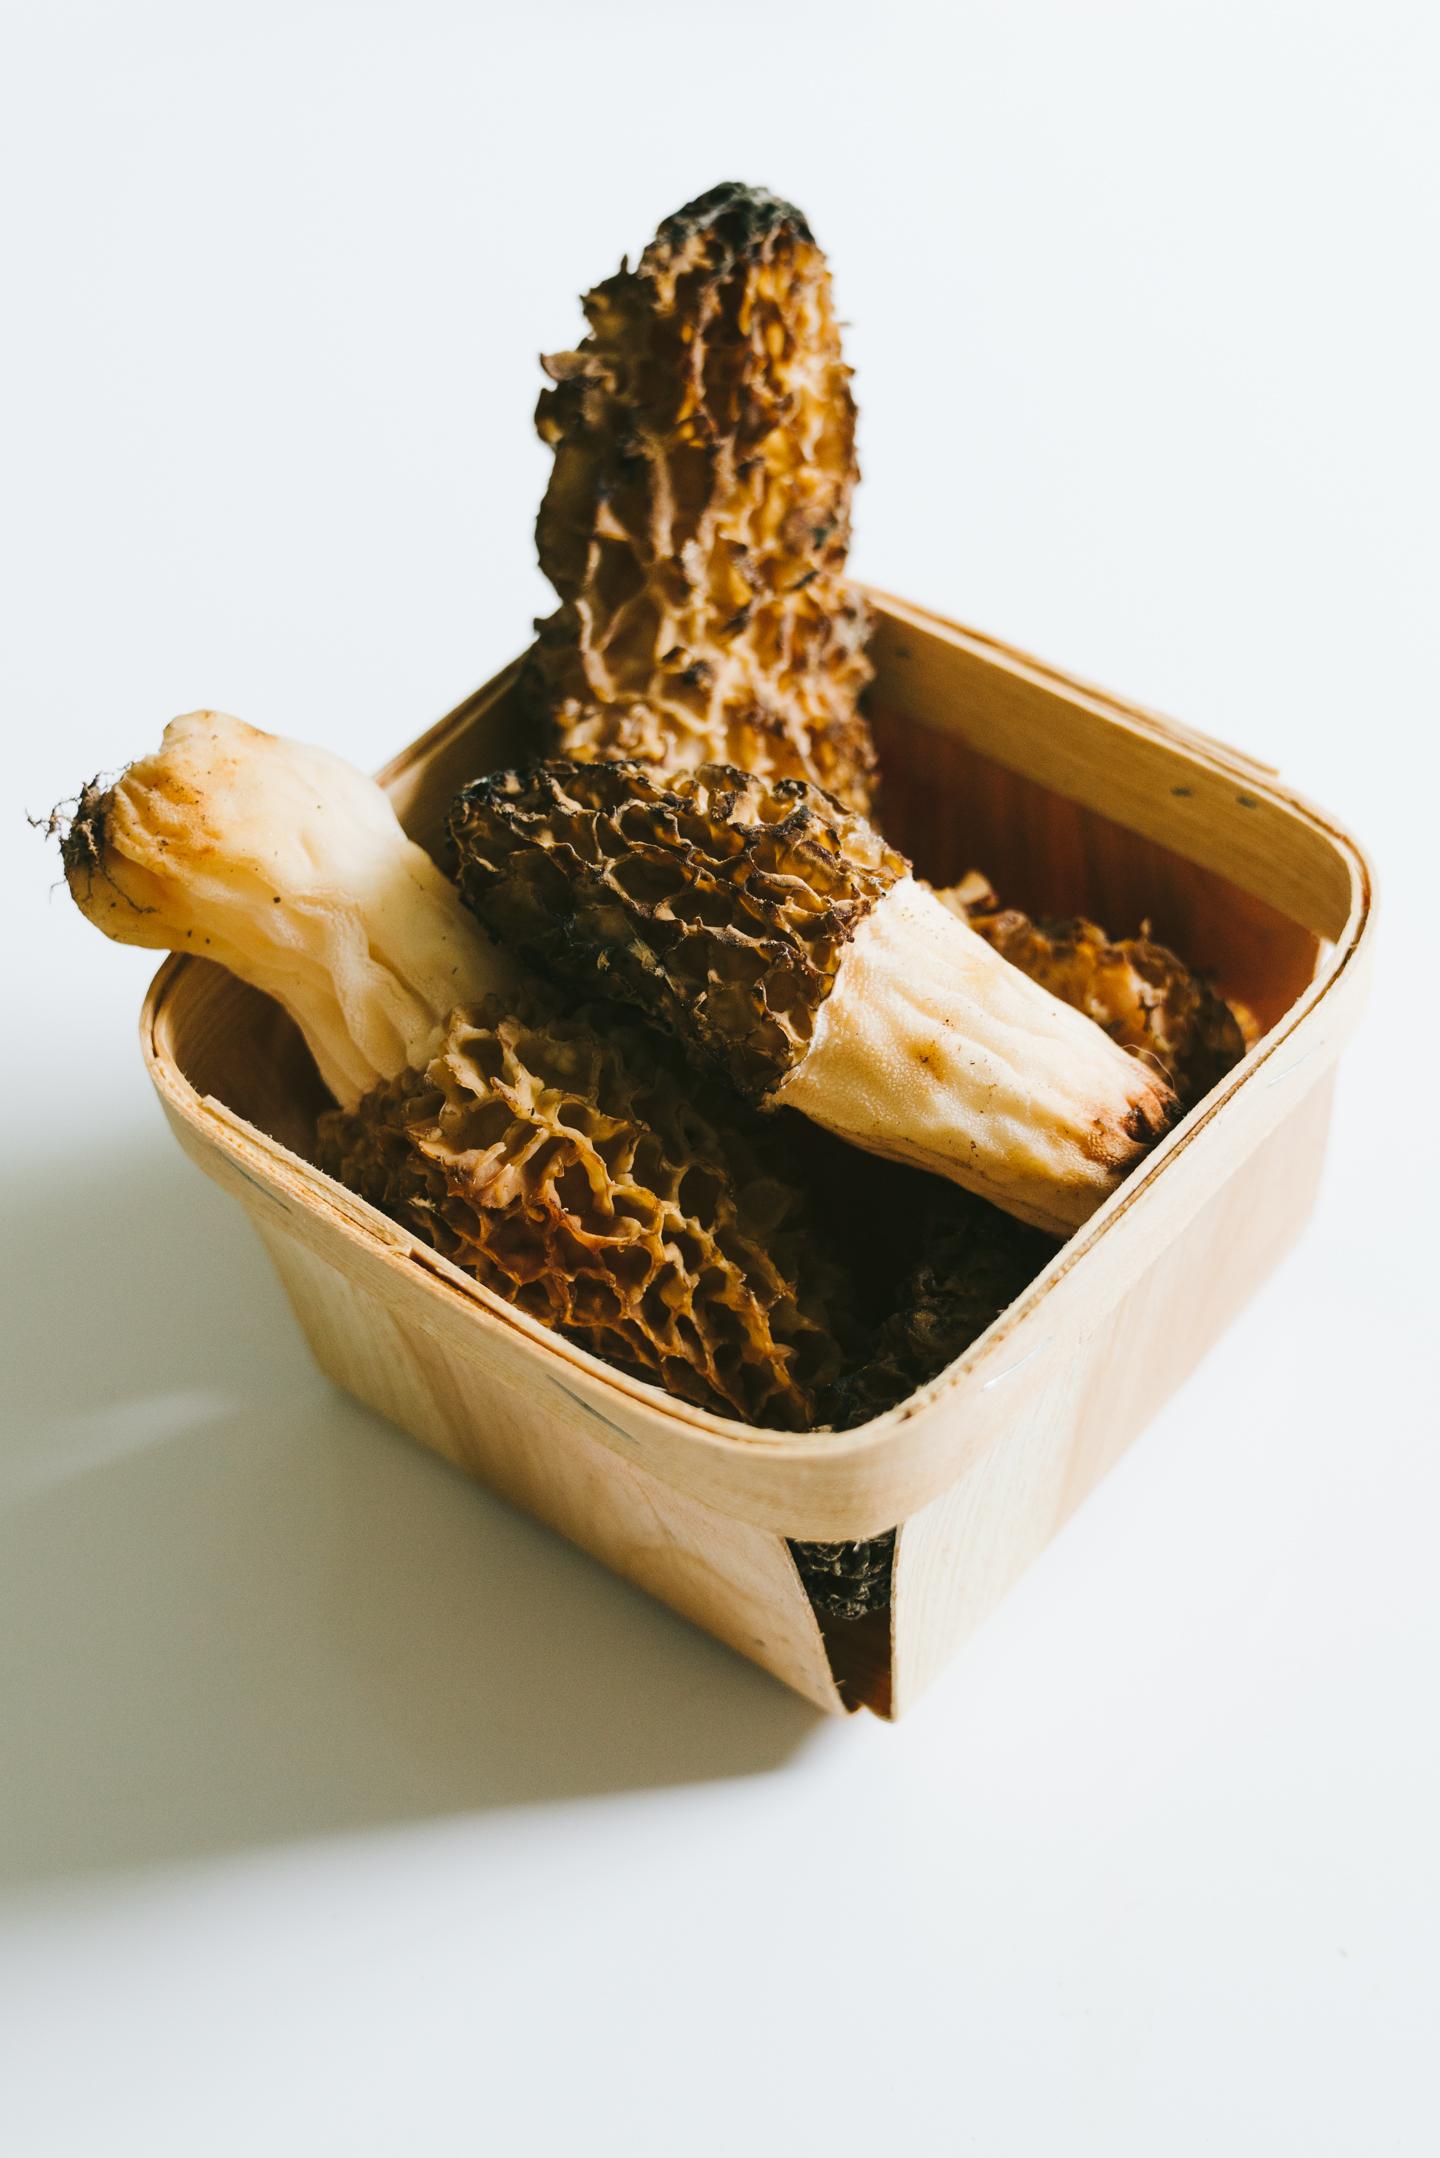 morrell mushrooms